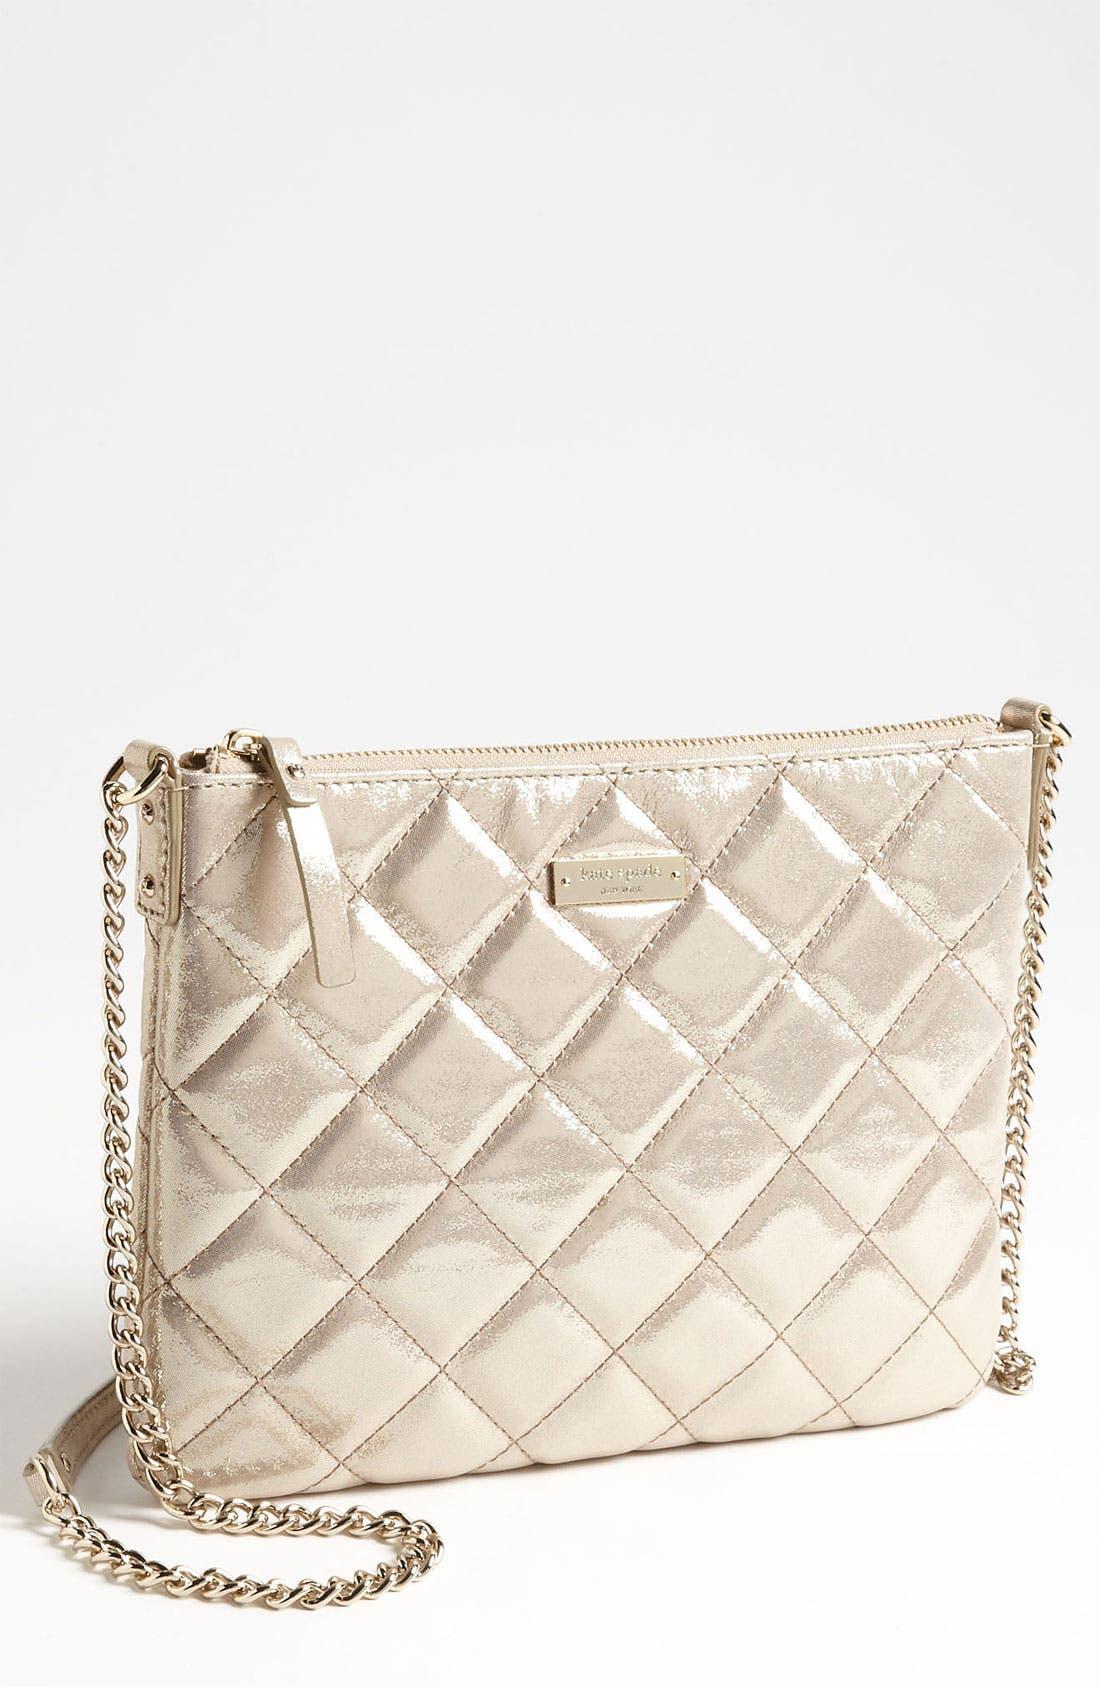 Main Image - kate spade new york 'gold coast - ginnie' crossbody bag